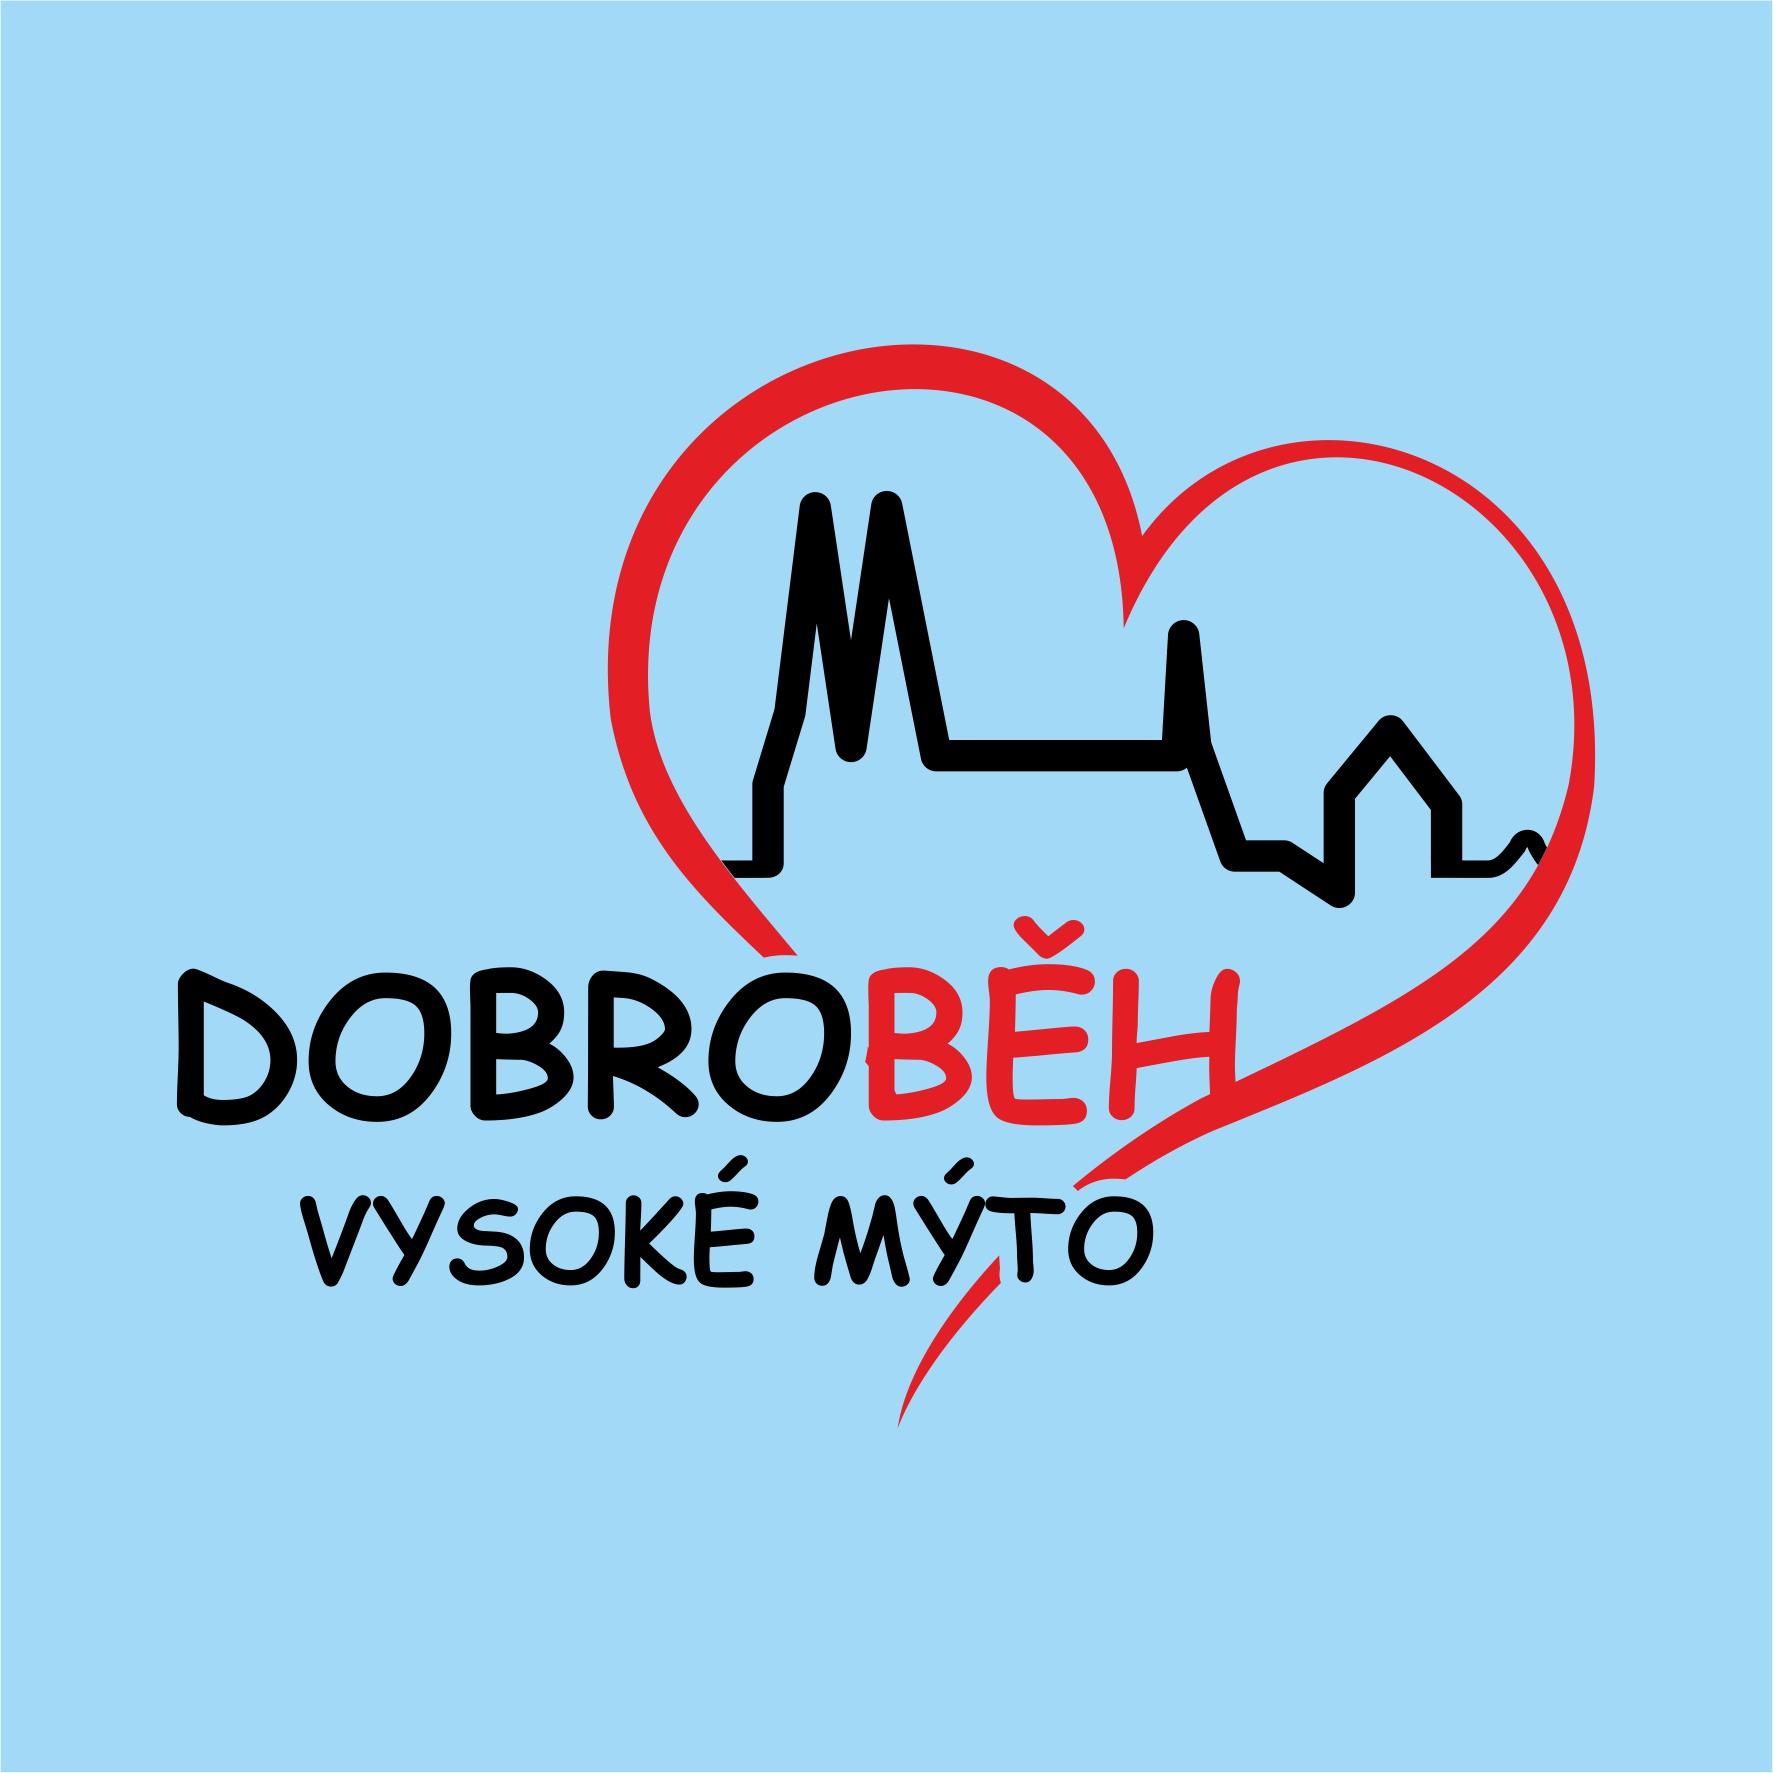 /images/com_odtatierkdunaju/teams/2021_DOBROB--H-Vysok---M--to.jpg